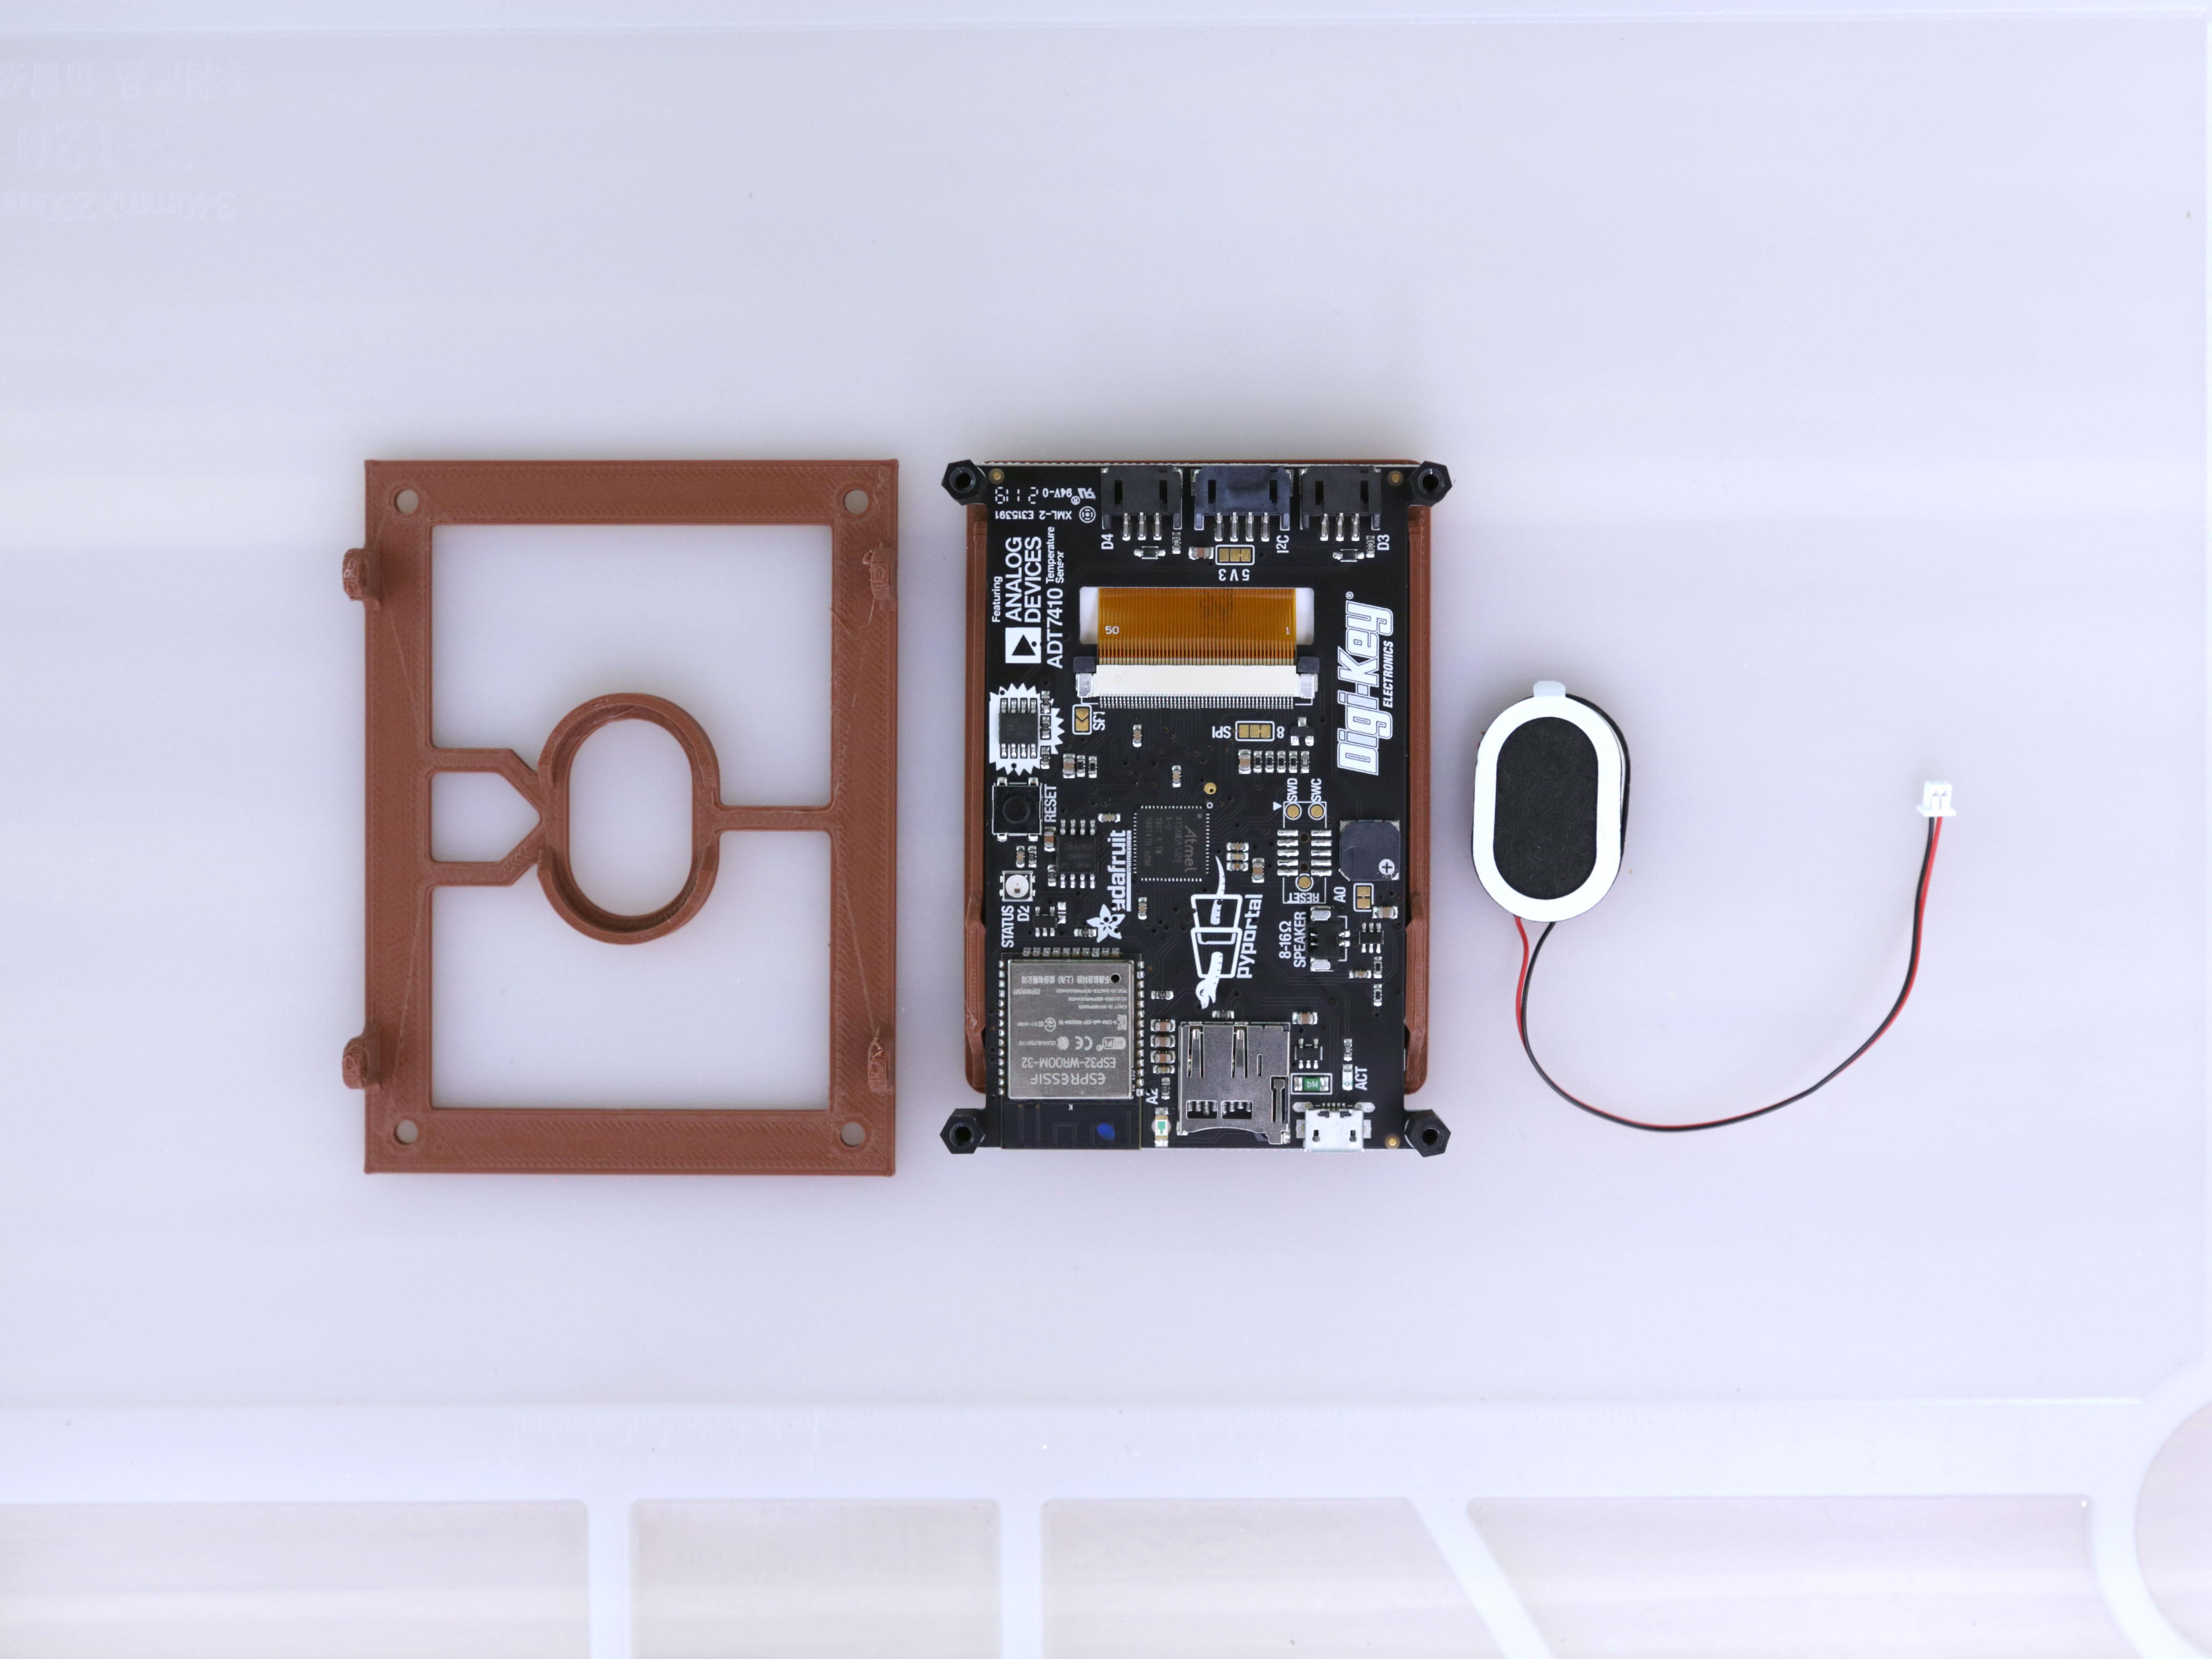 3d_printing_pcb-plate-speaker.jpg